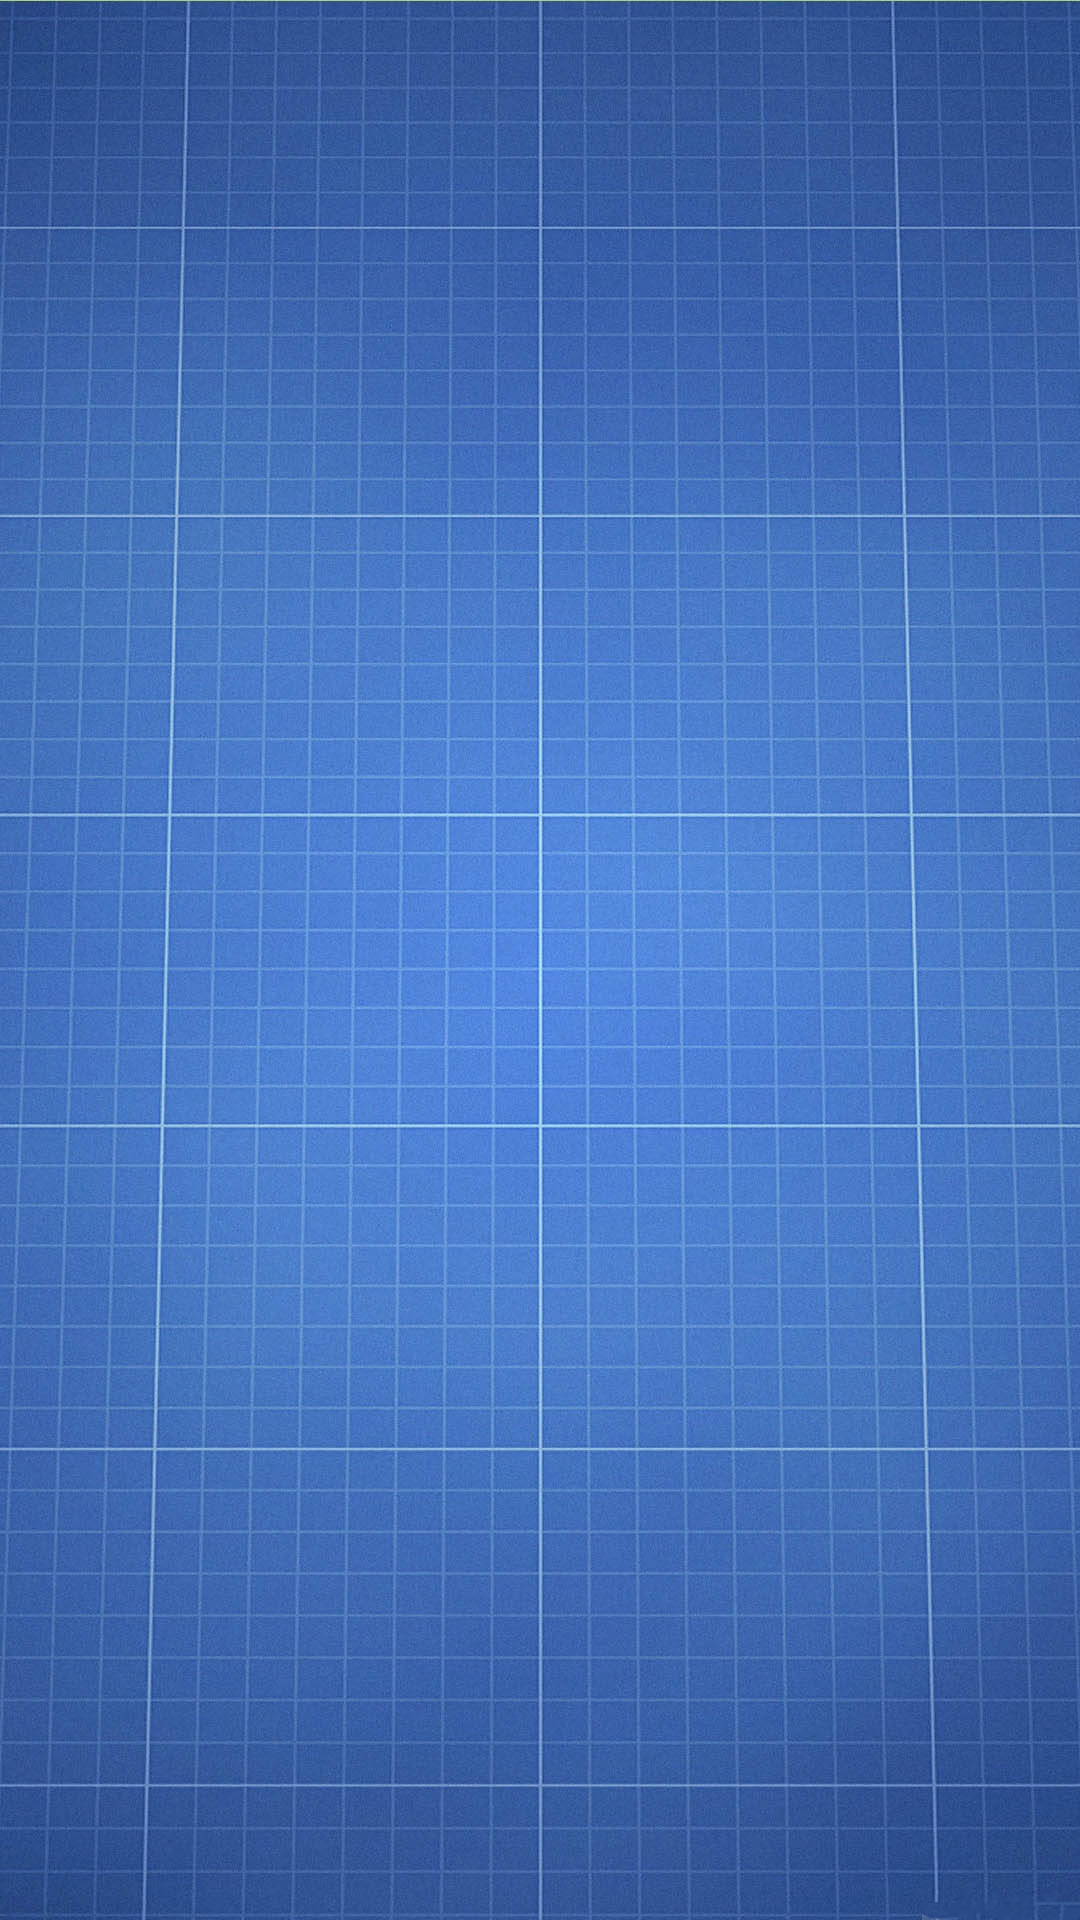 Grid wallpaper wallpapersafari blueprint grid android wallpaper free download malvernweather Gallery